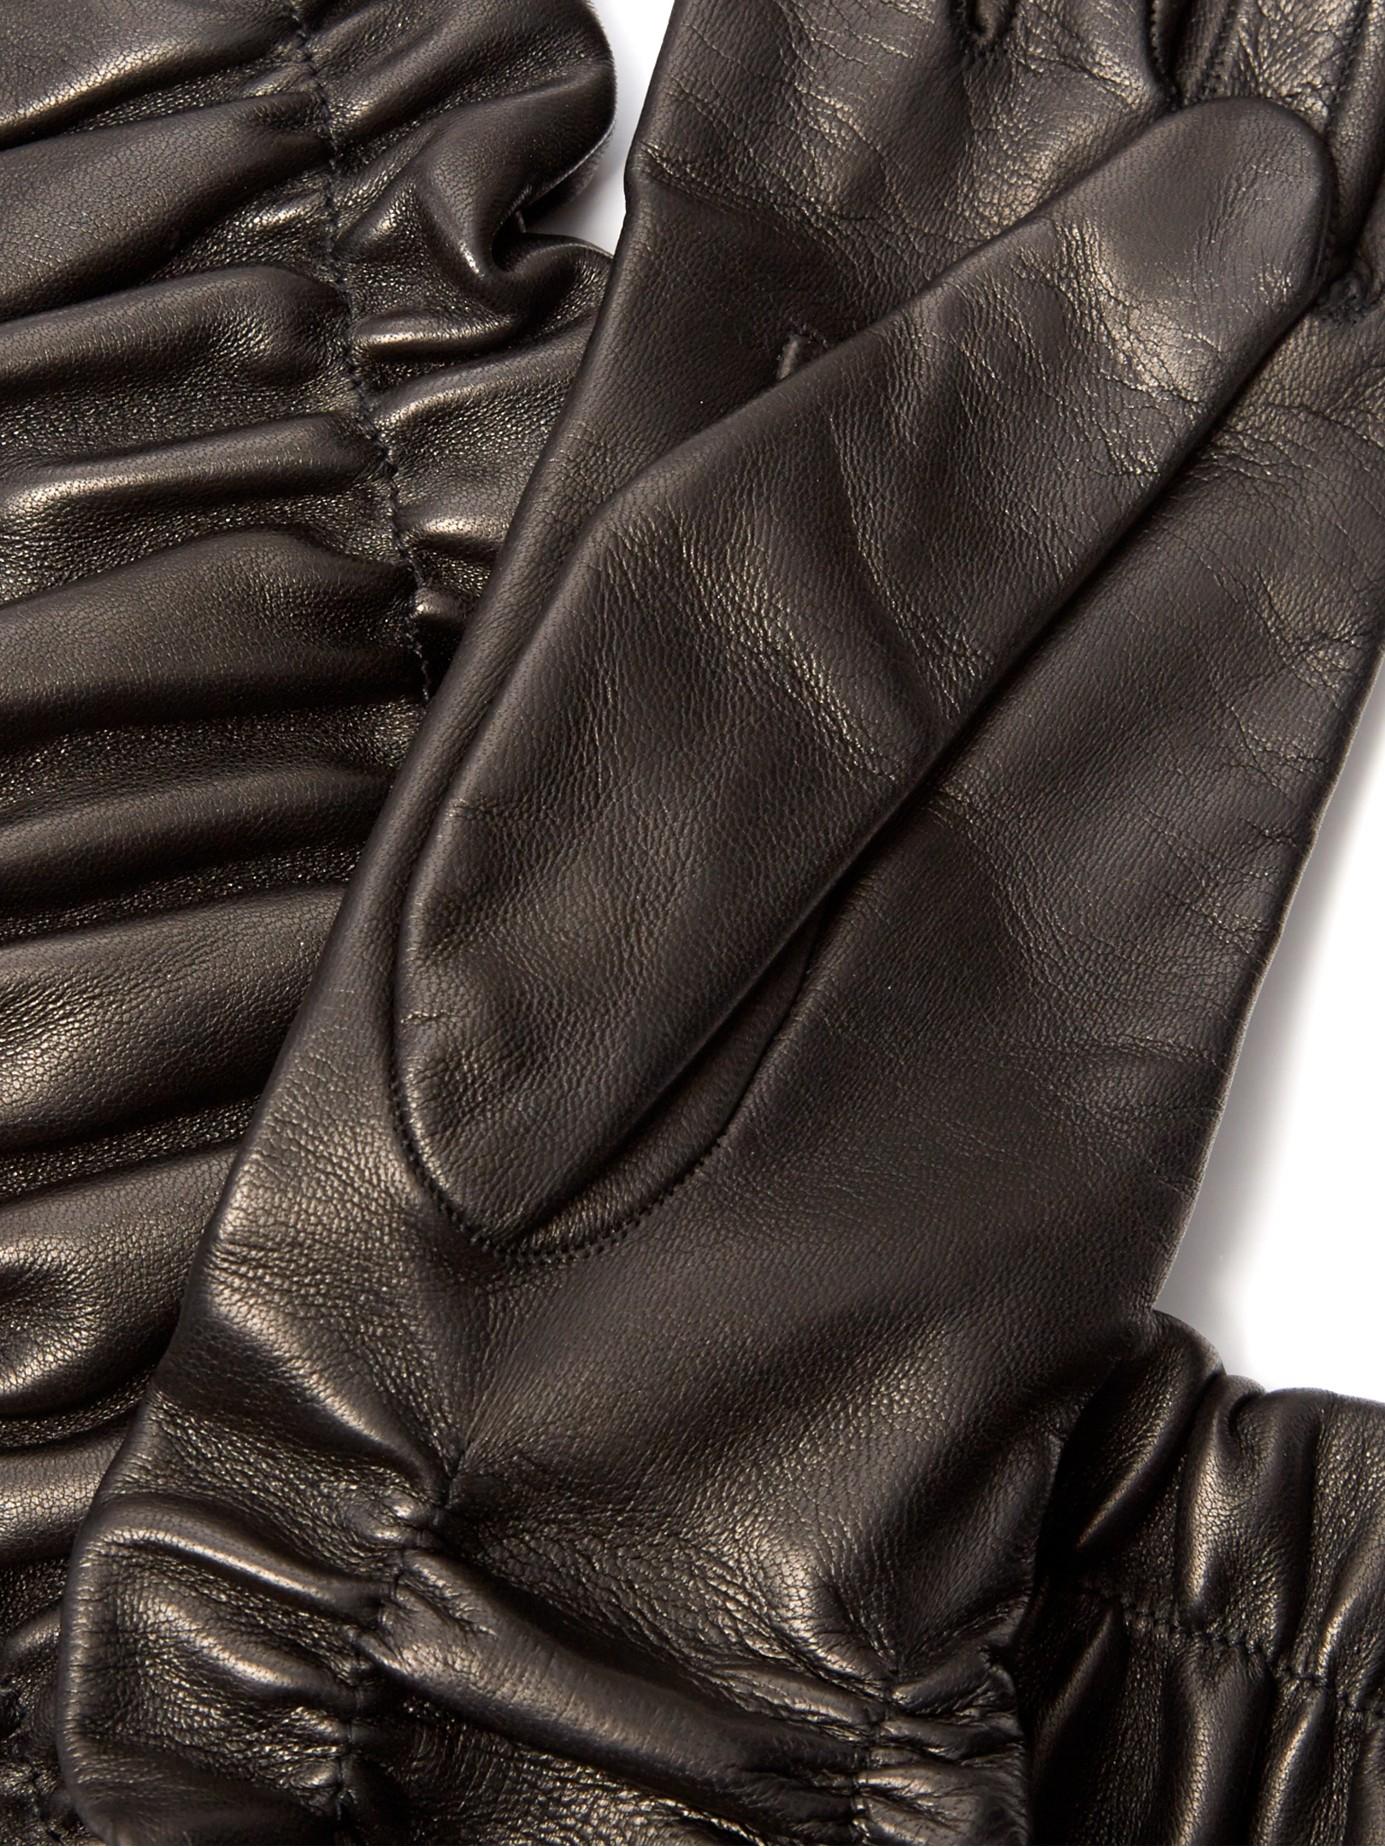 Alex d leather gloves compilation 9